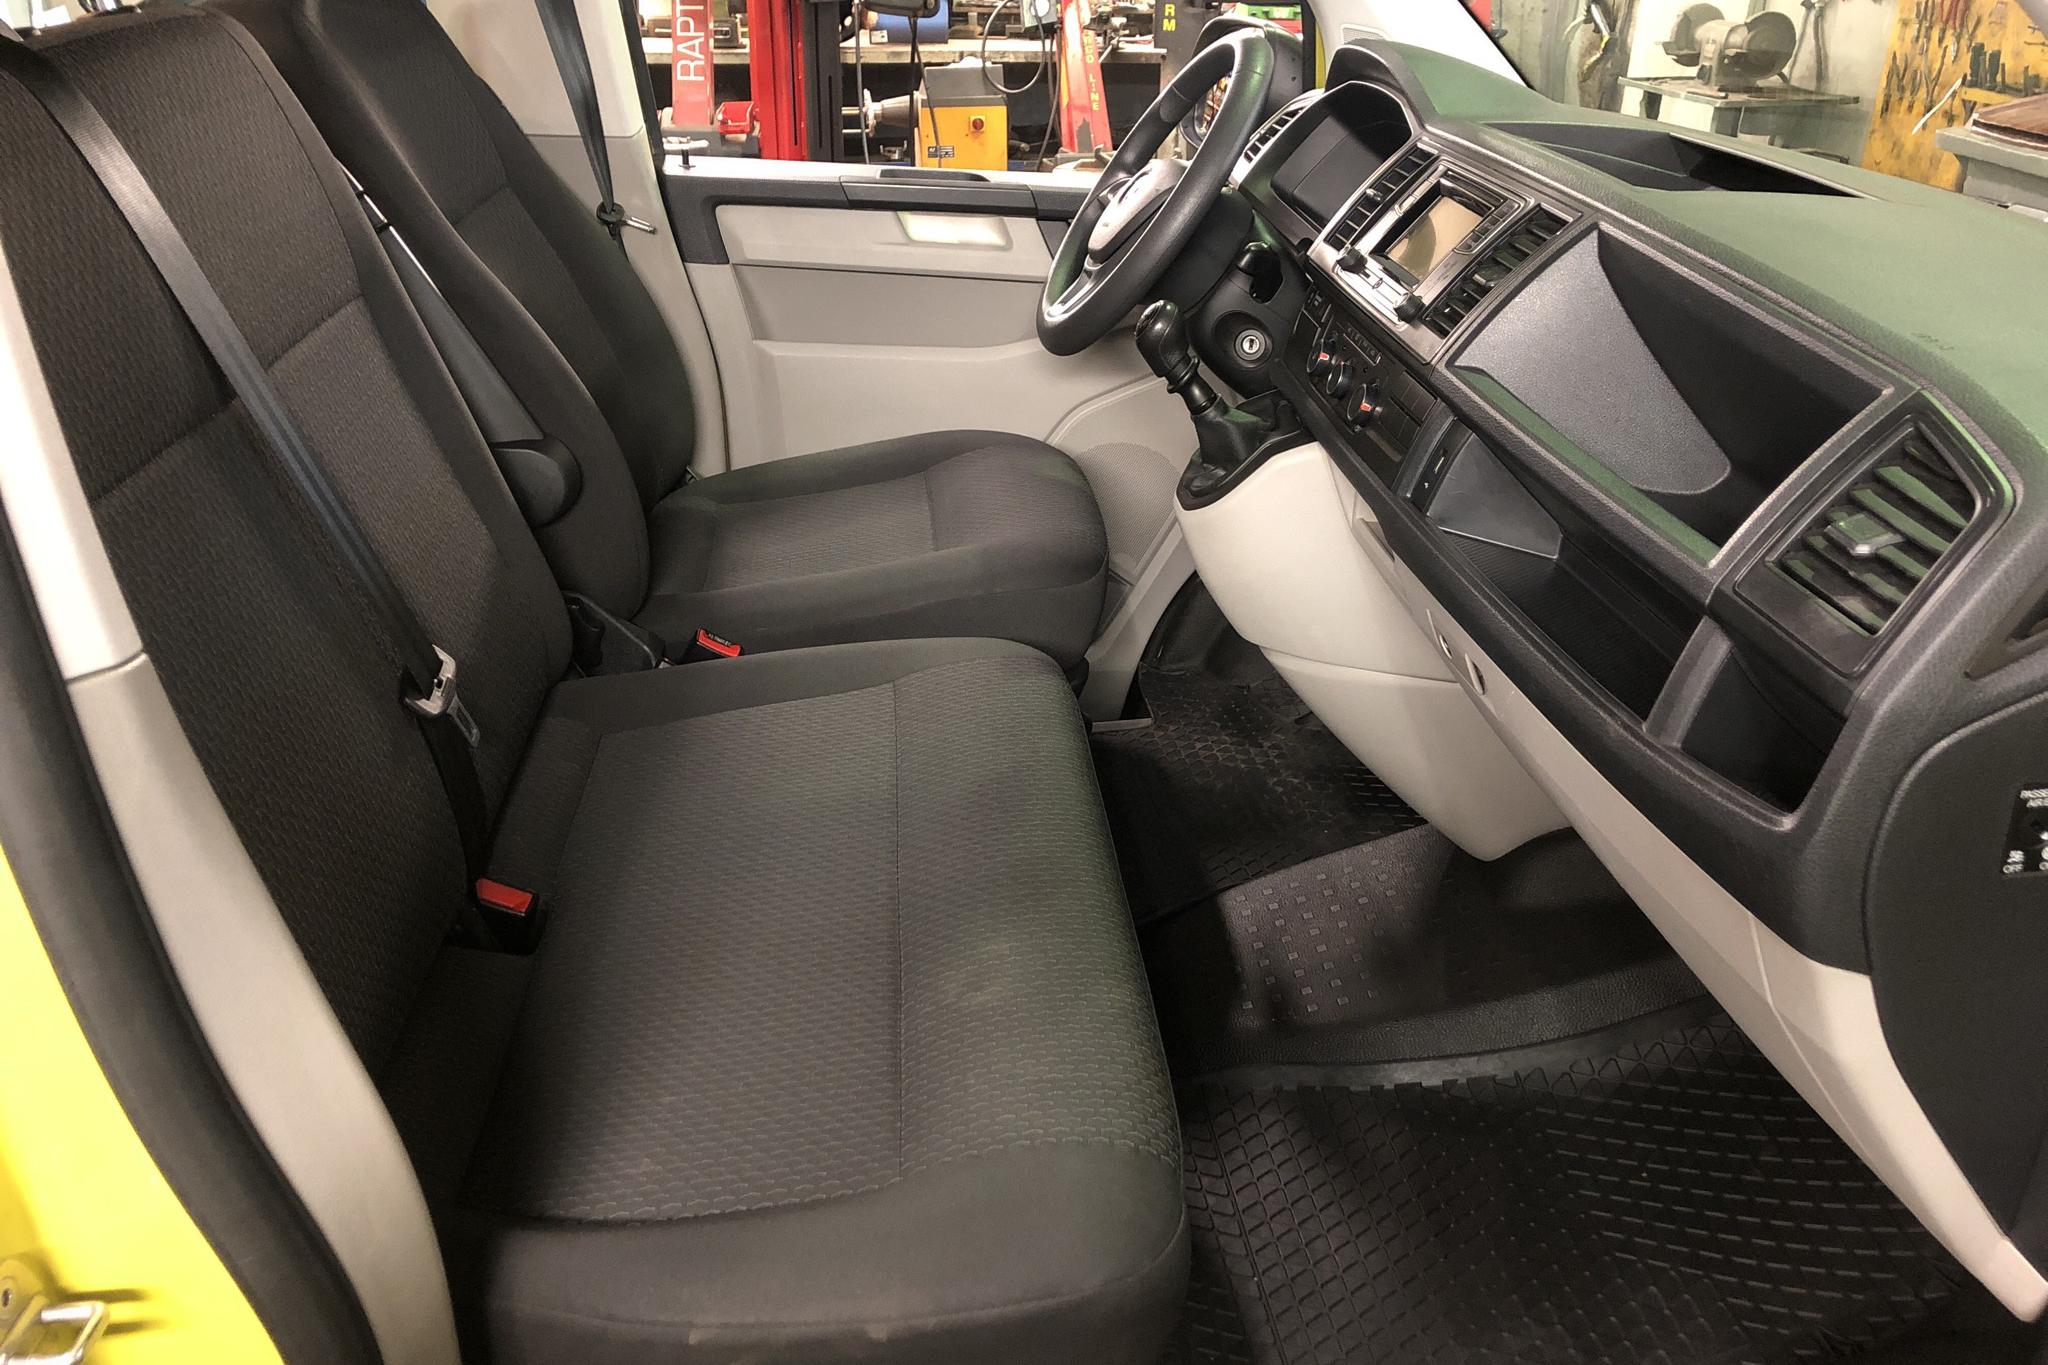 VW Caravelle T6 2.0 TDI BMT (150hk) - 158 660 km - Manual - yellow - 2016